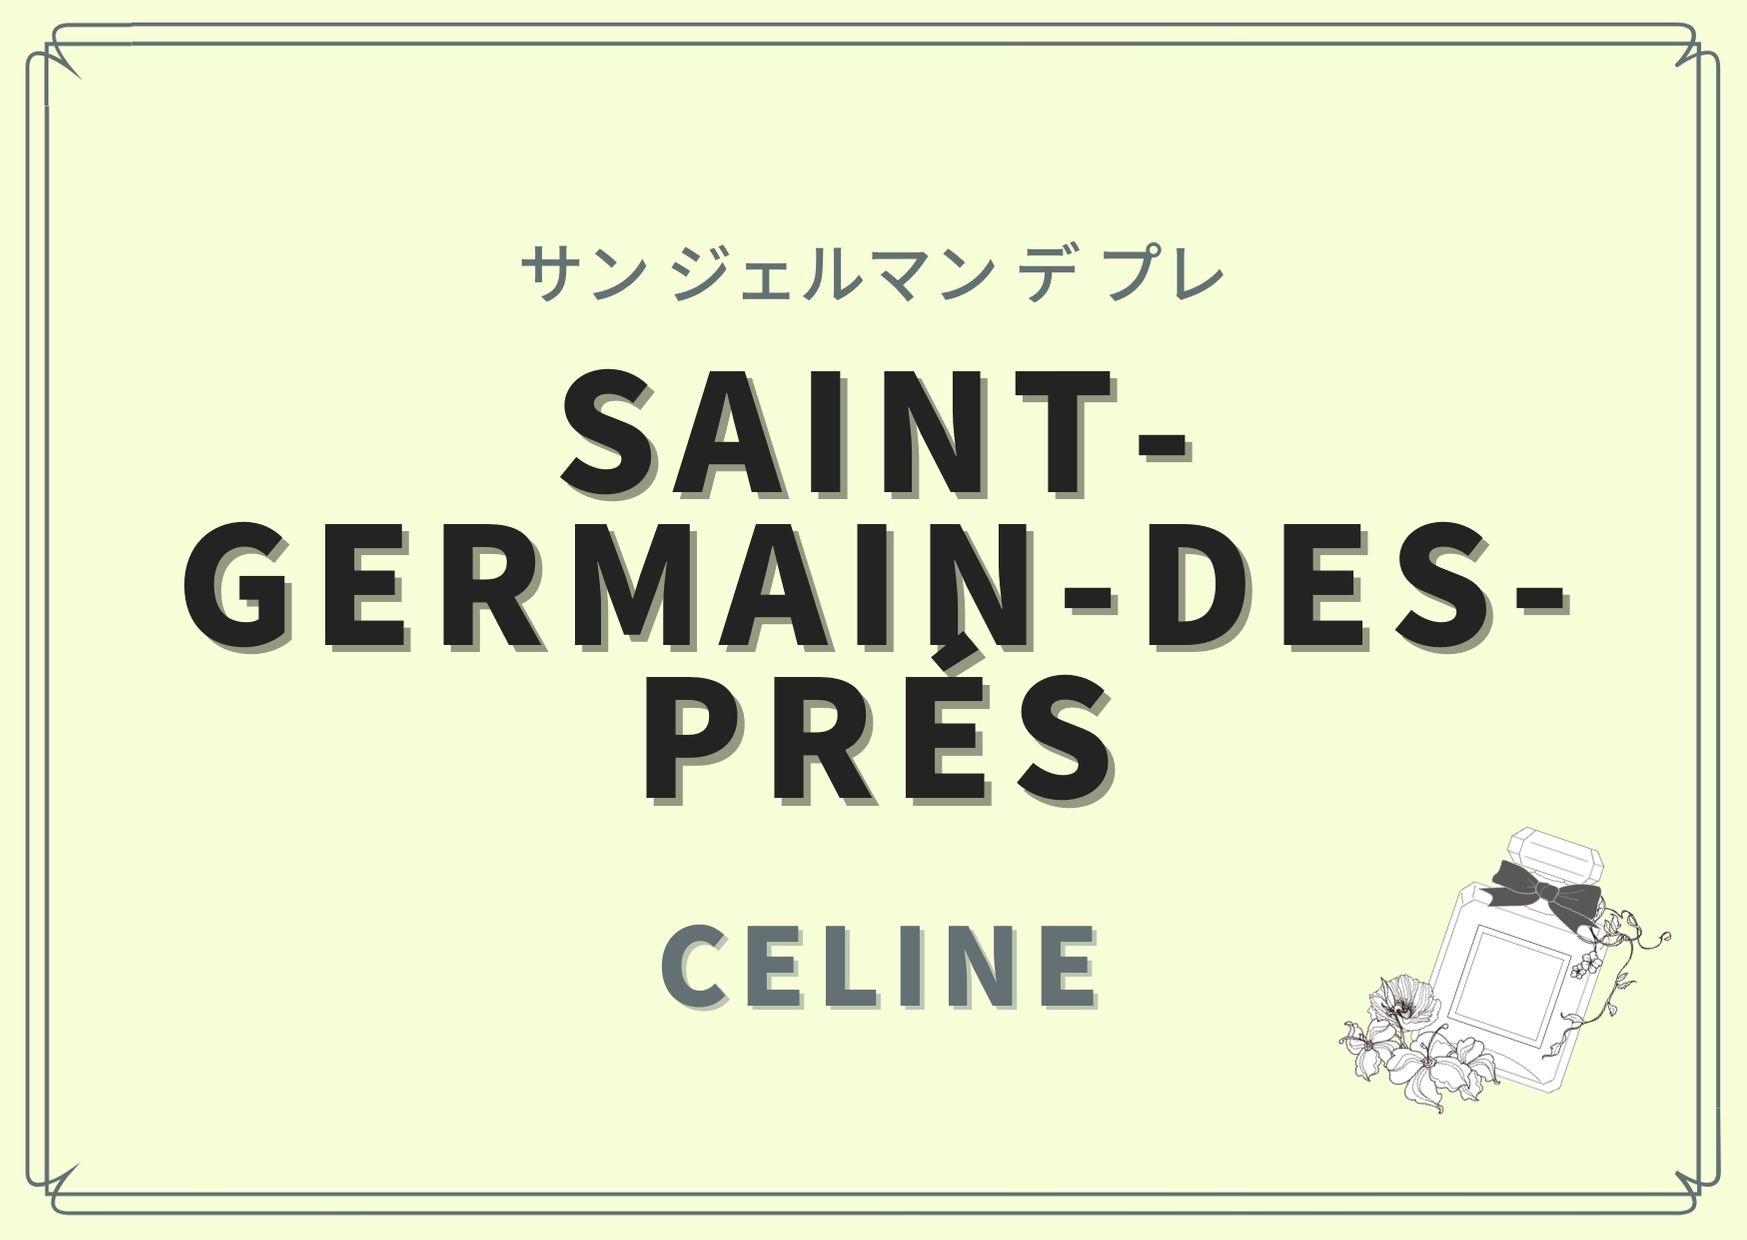 SAINT-GERMAIN-DES-PRÉS(サン ジェルマン デ プレ)/CELINE(セリーヌ)